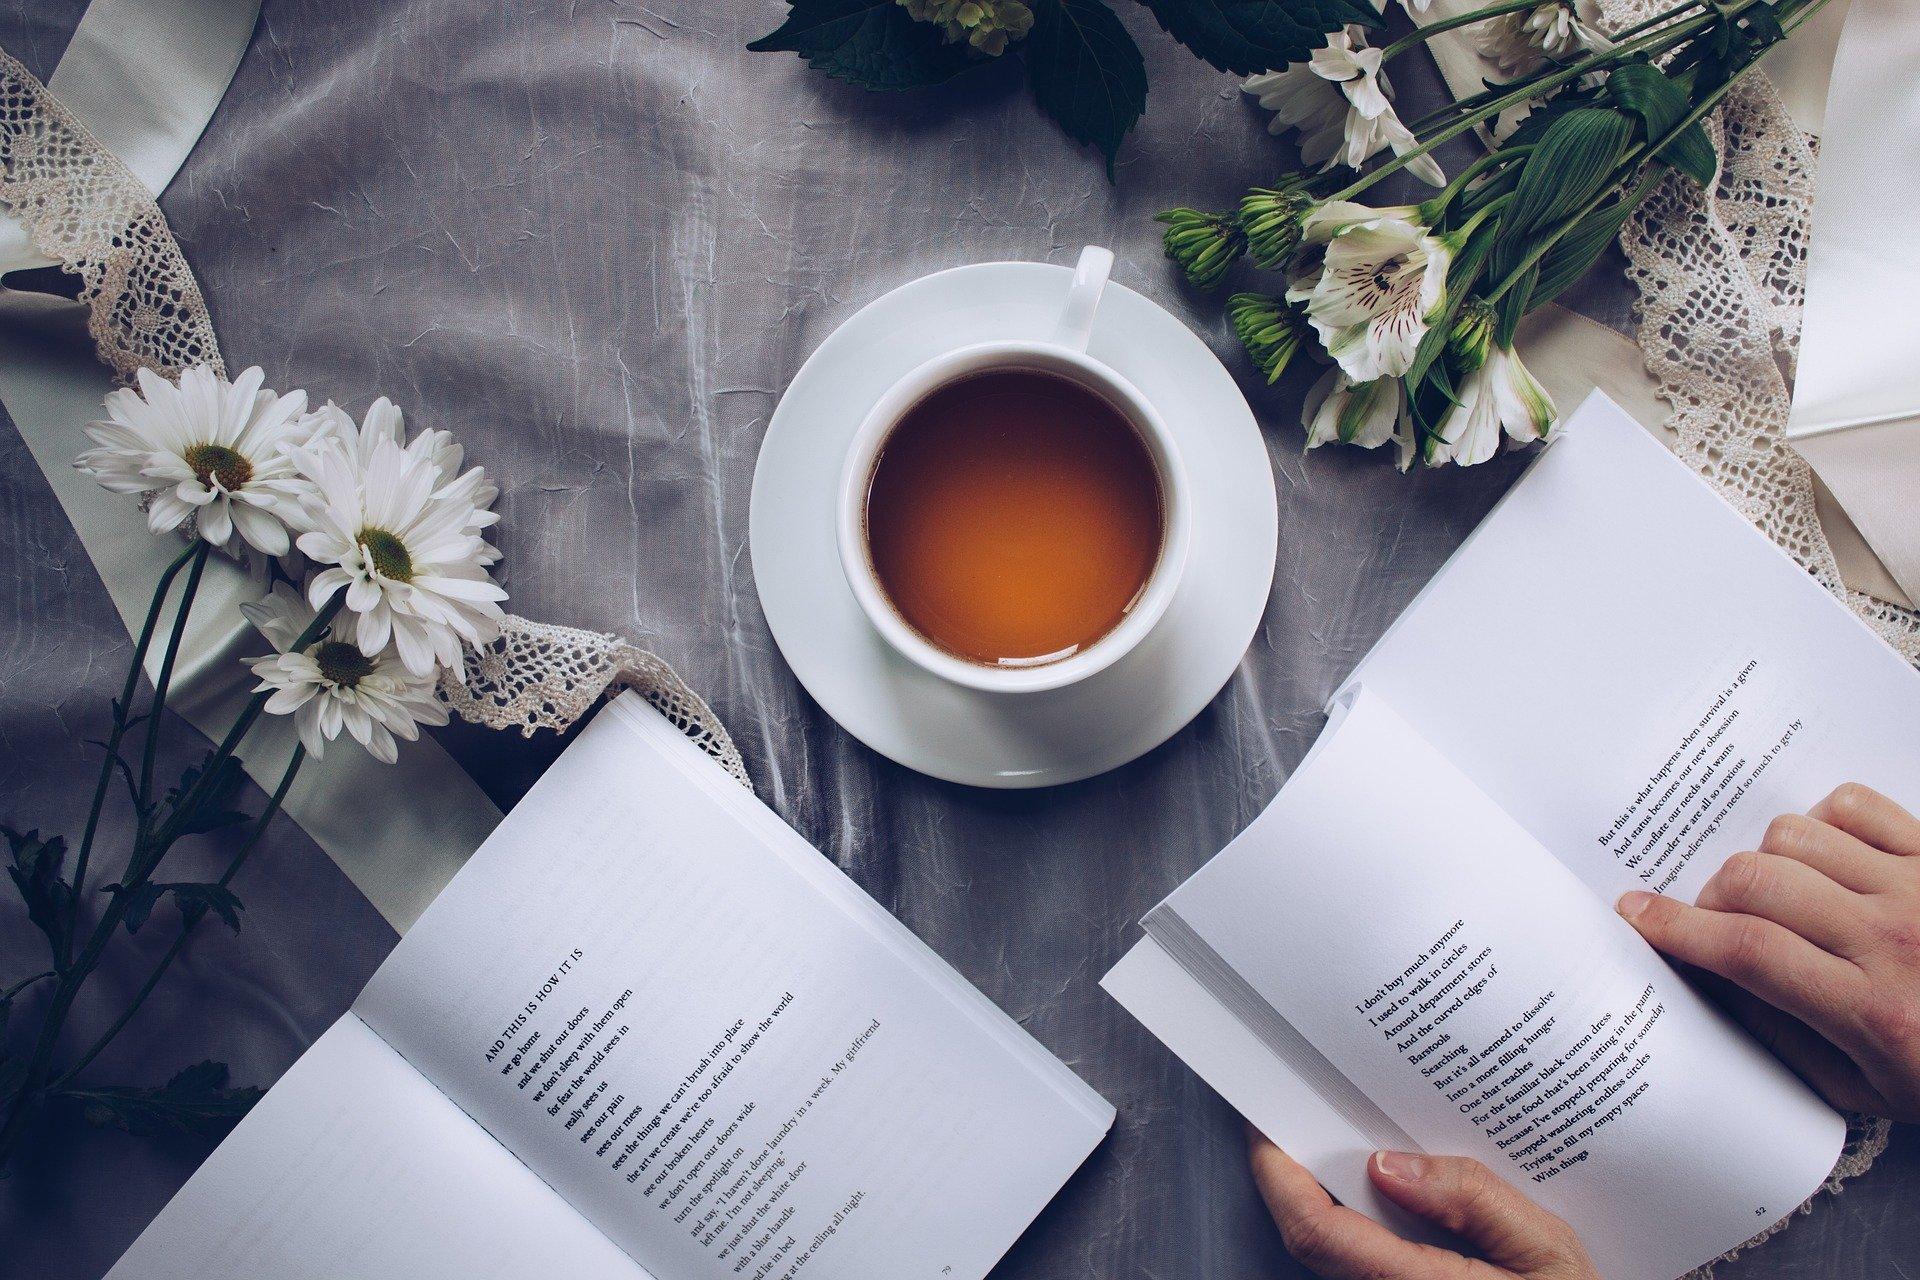 cup of tea amongst books